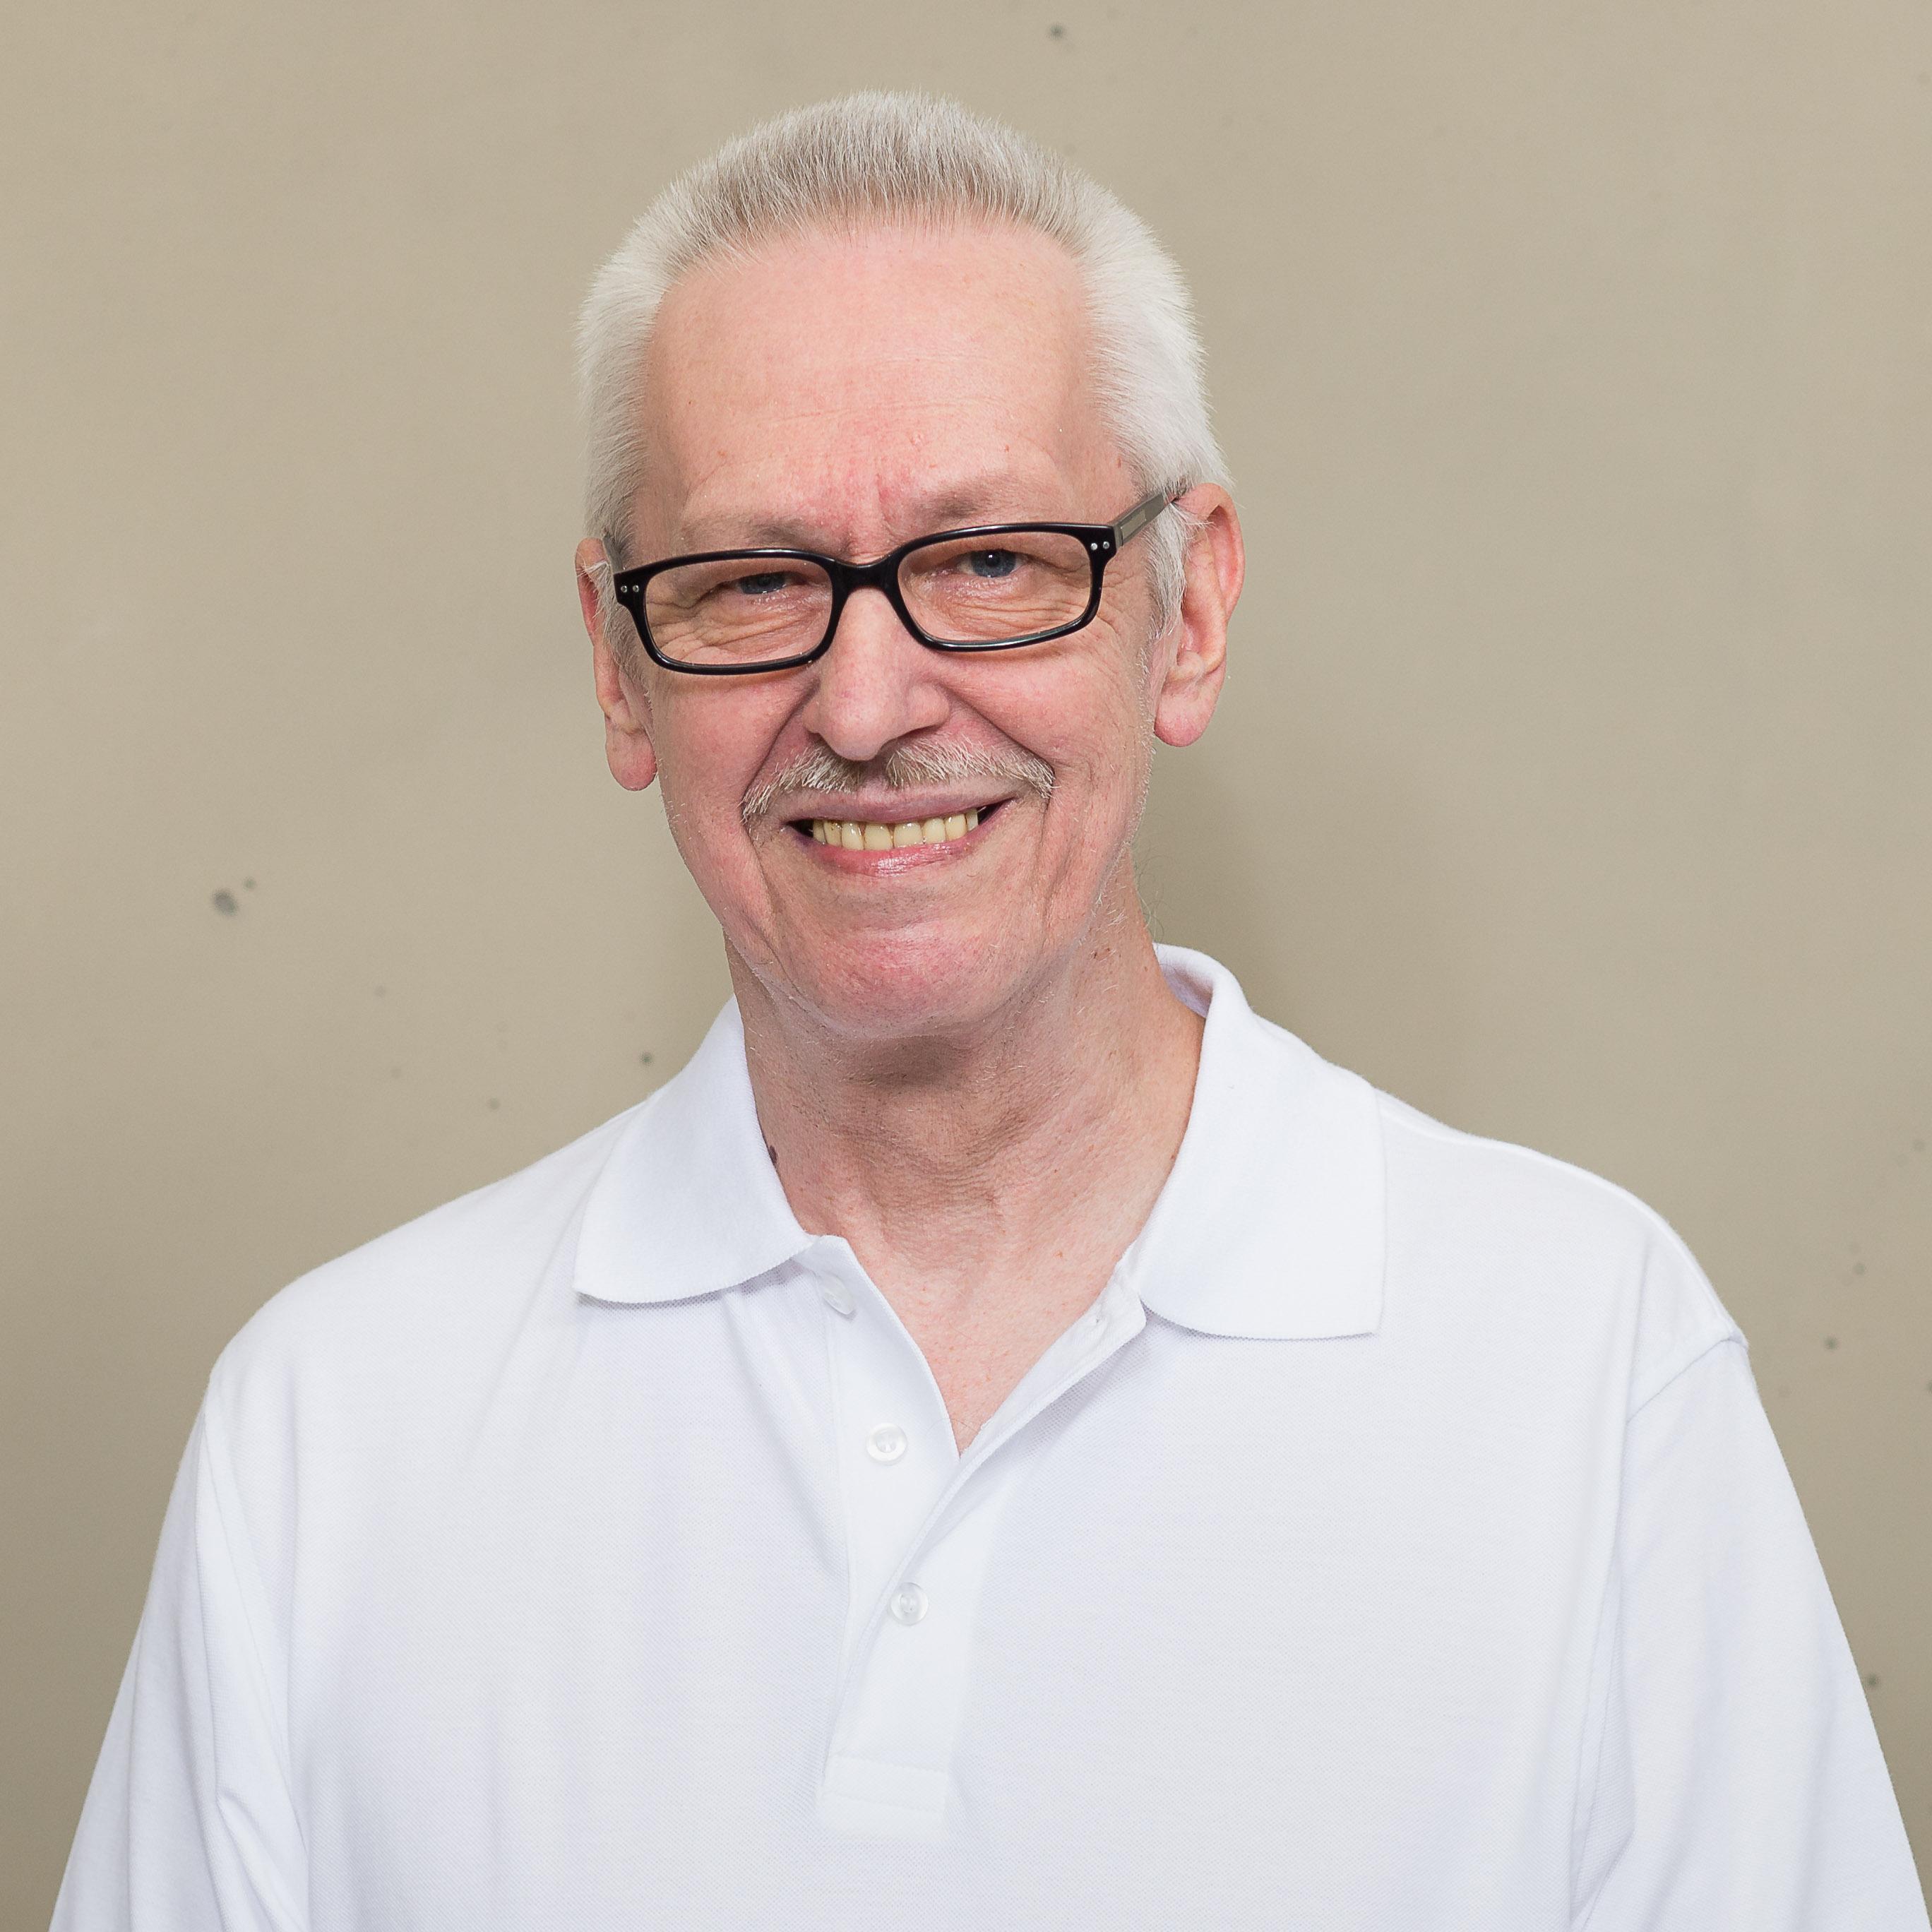 Ralf Scholz